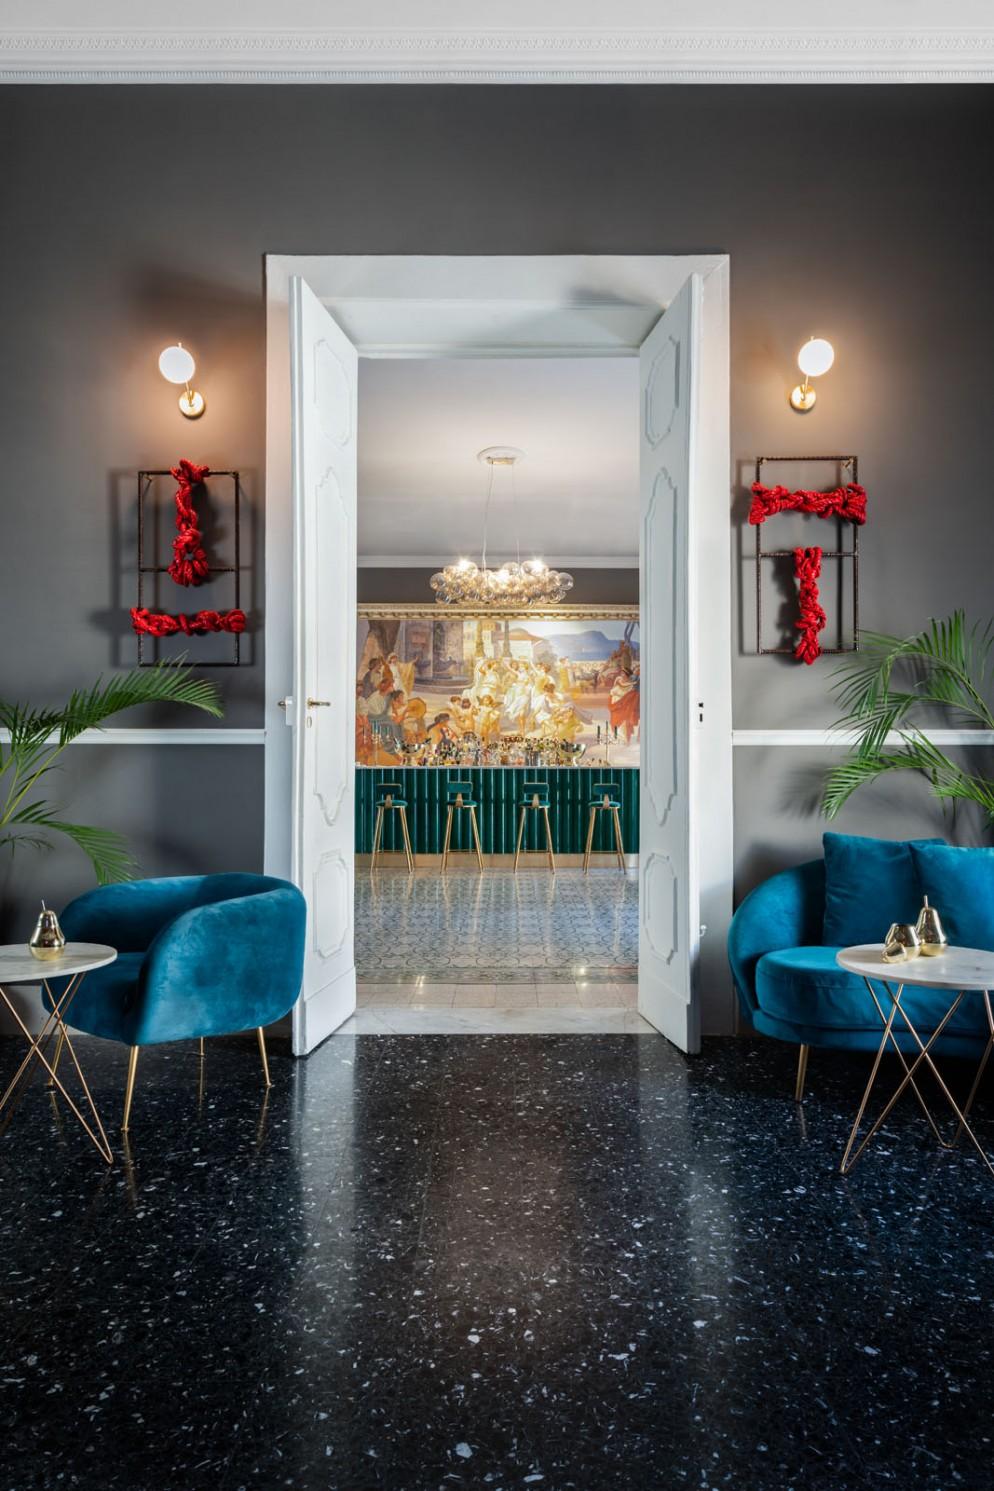 ristorante-lounge-bar-klu-caserta-01